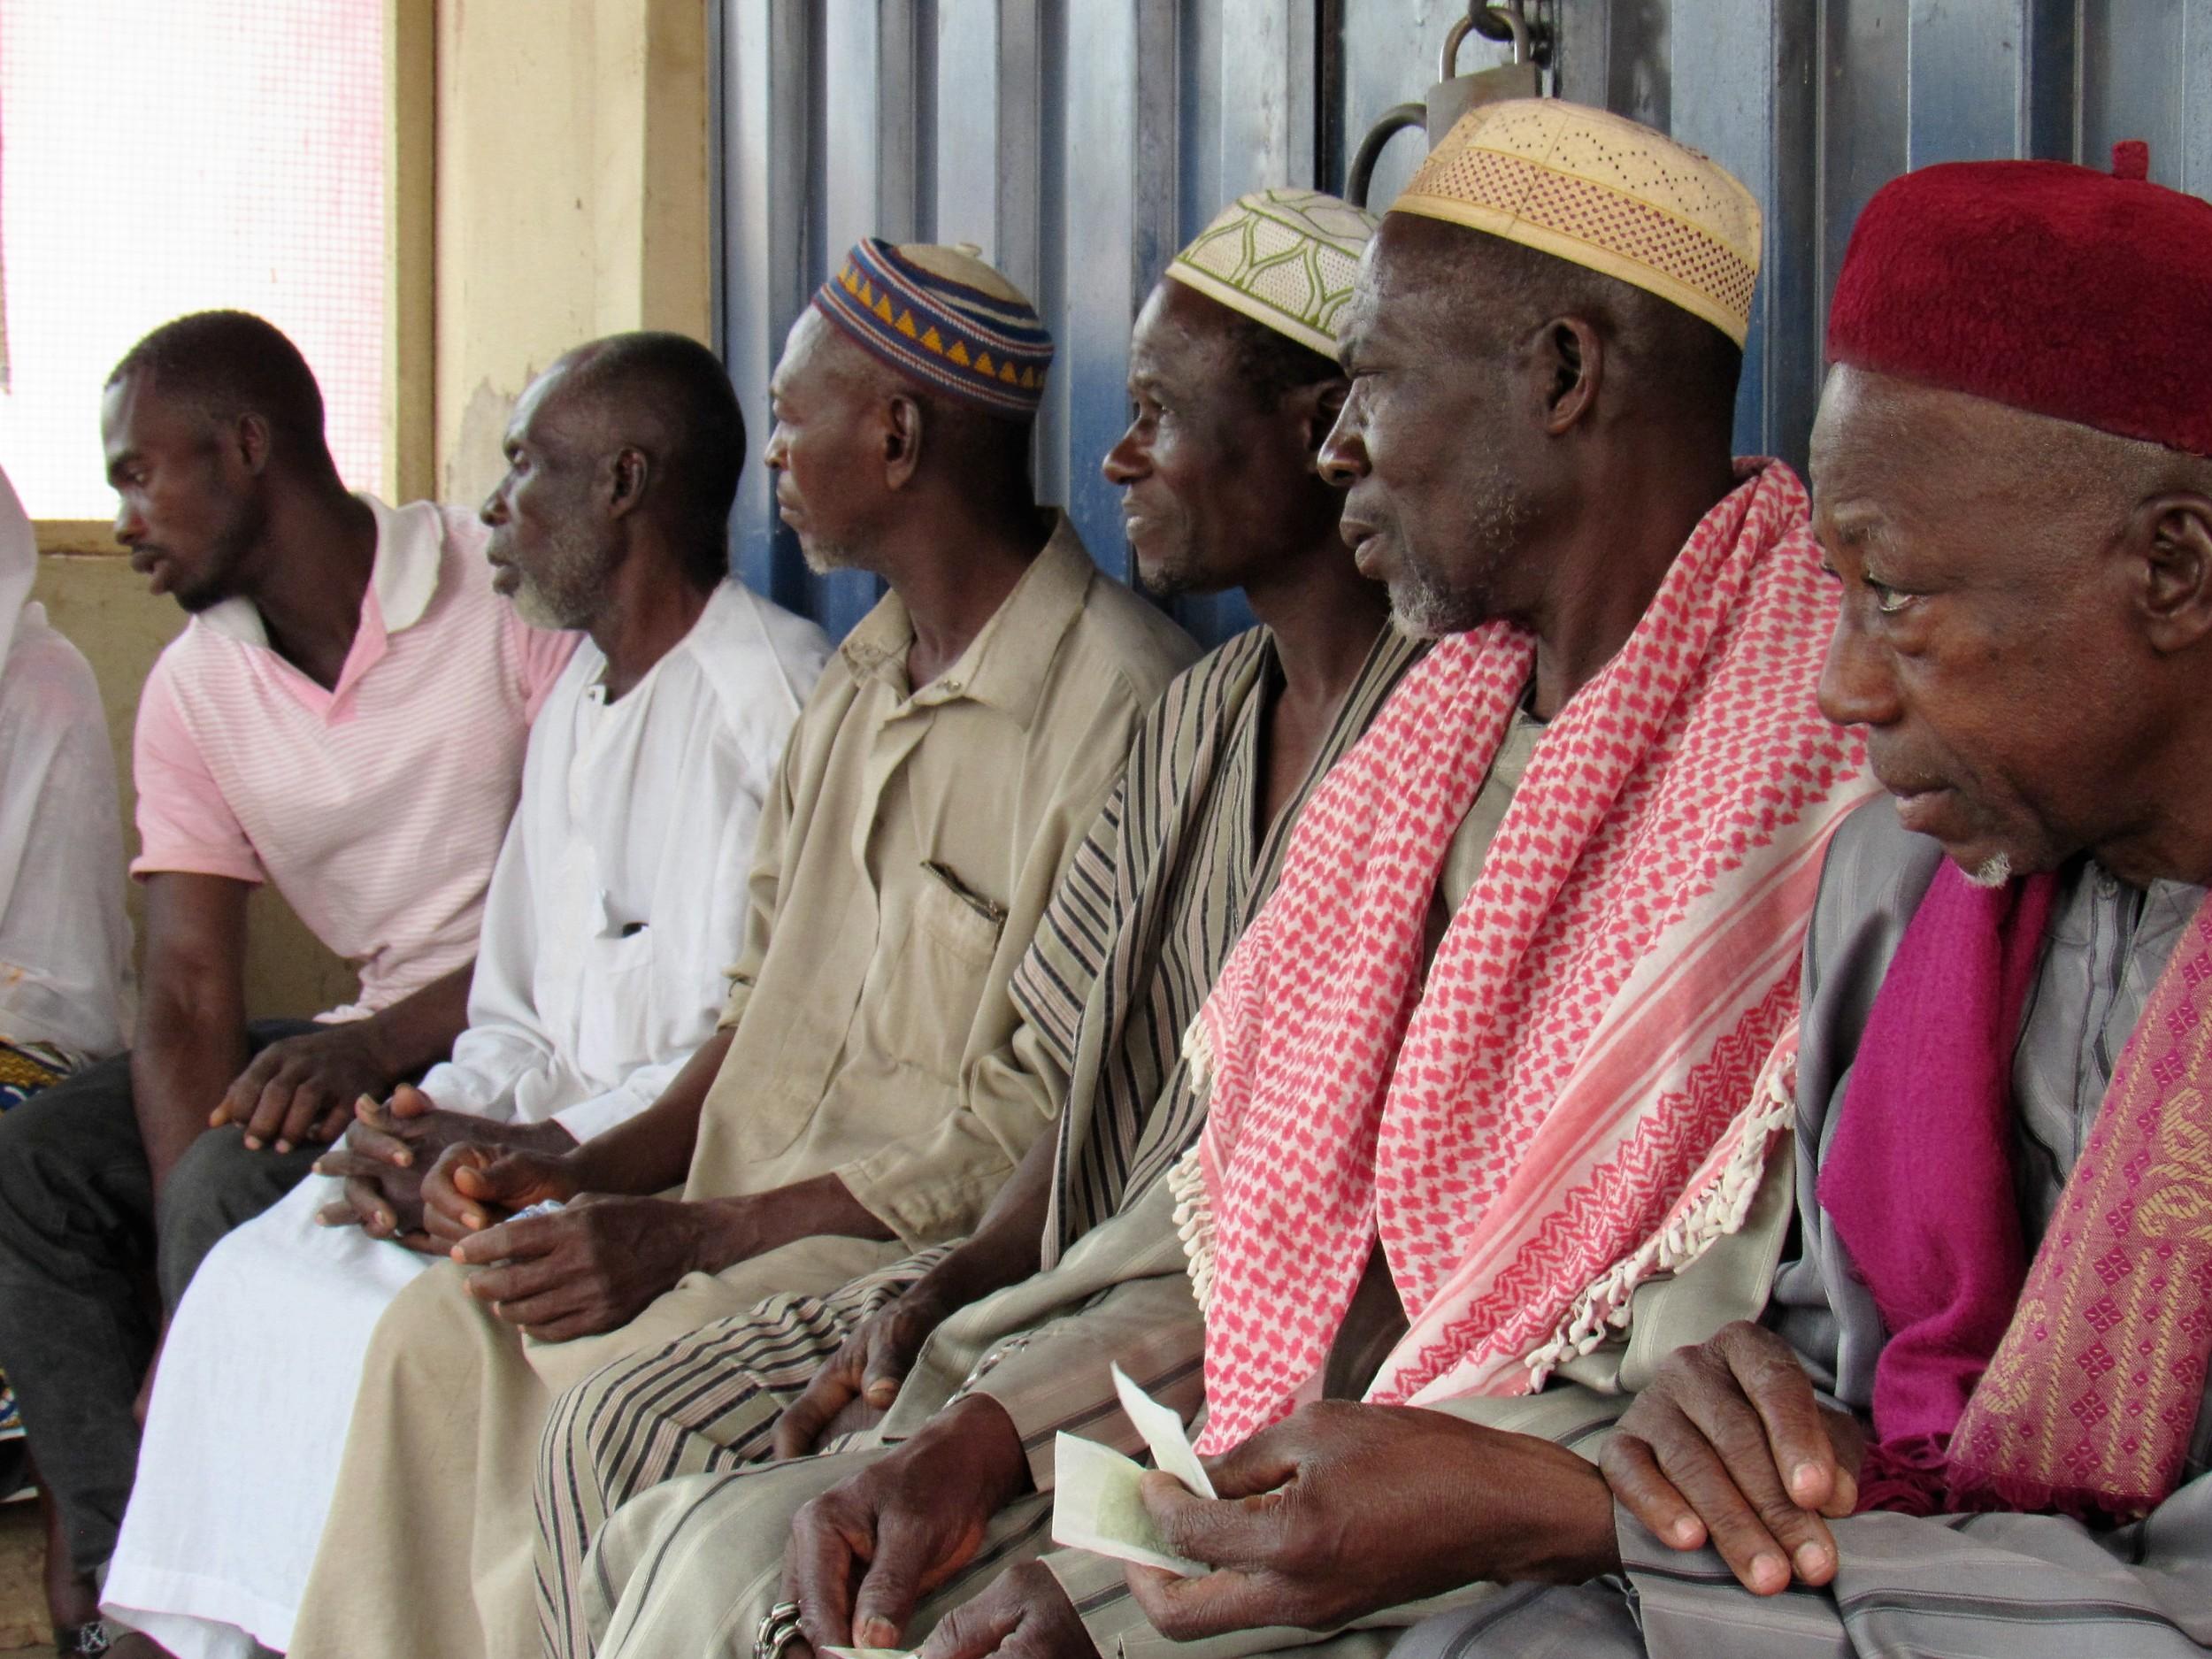 Moringa farmers from Ejore, Ghana share their stories